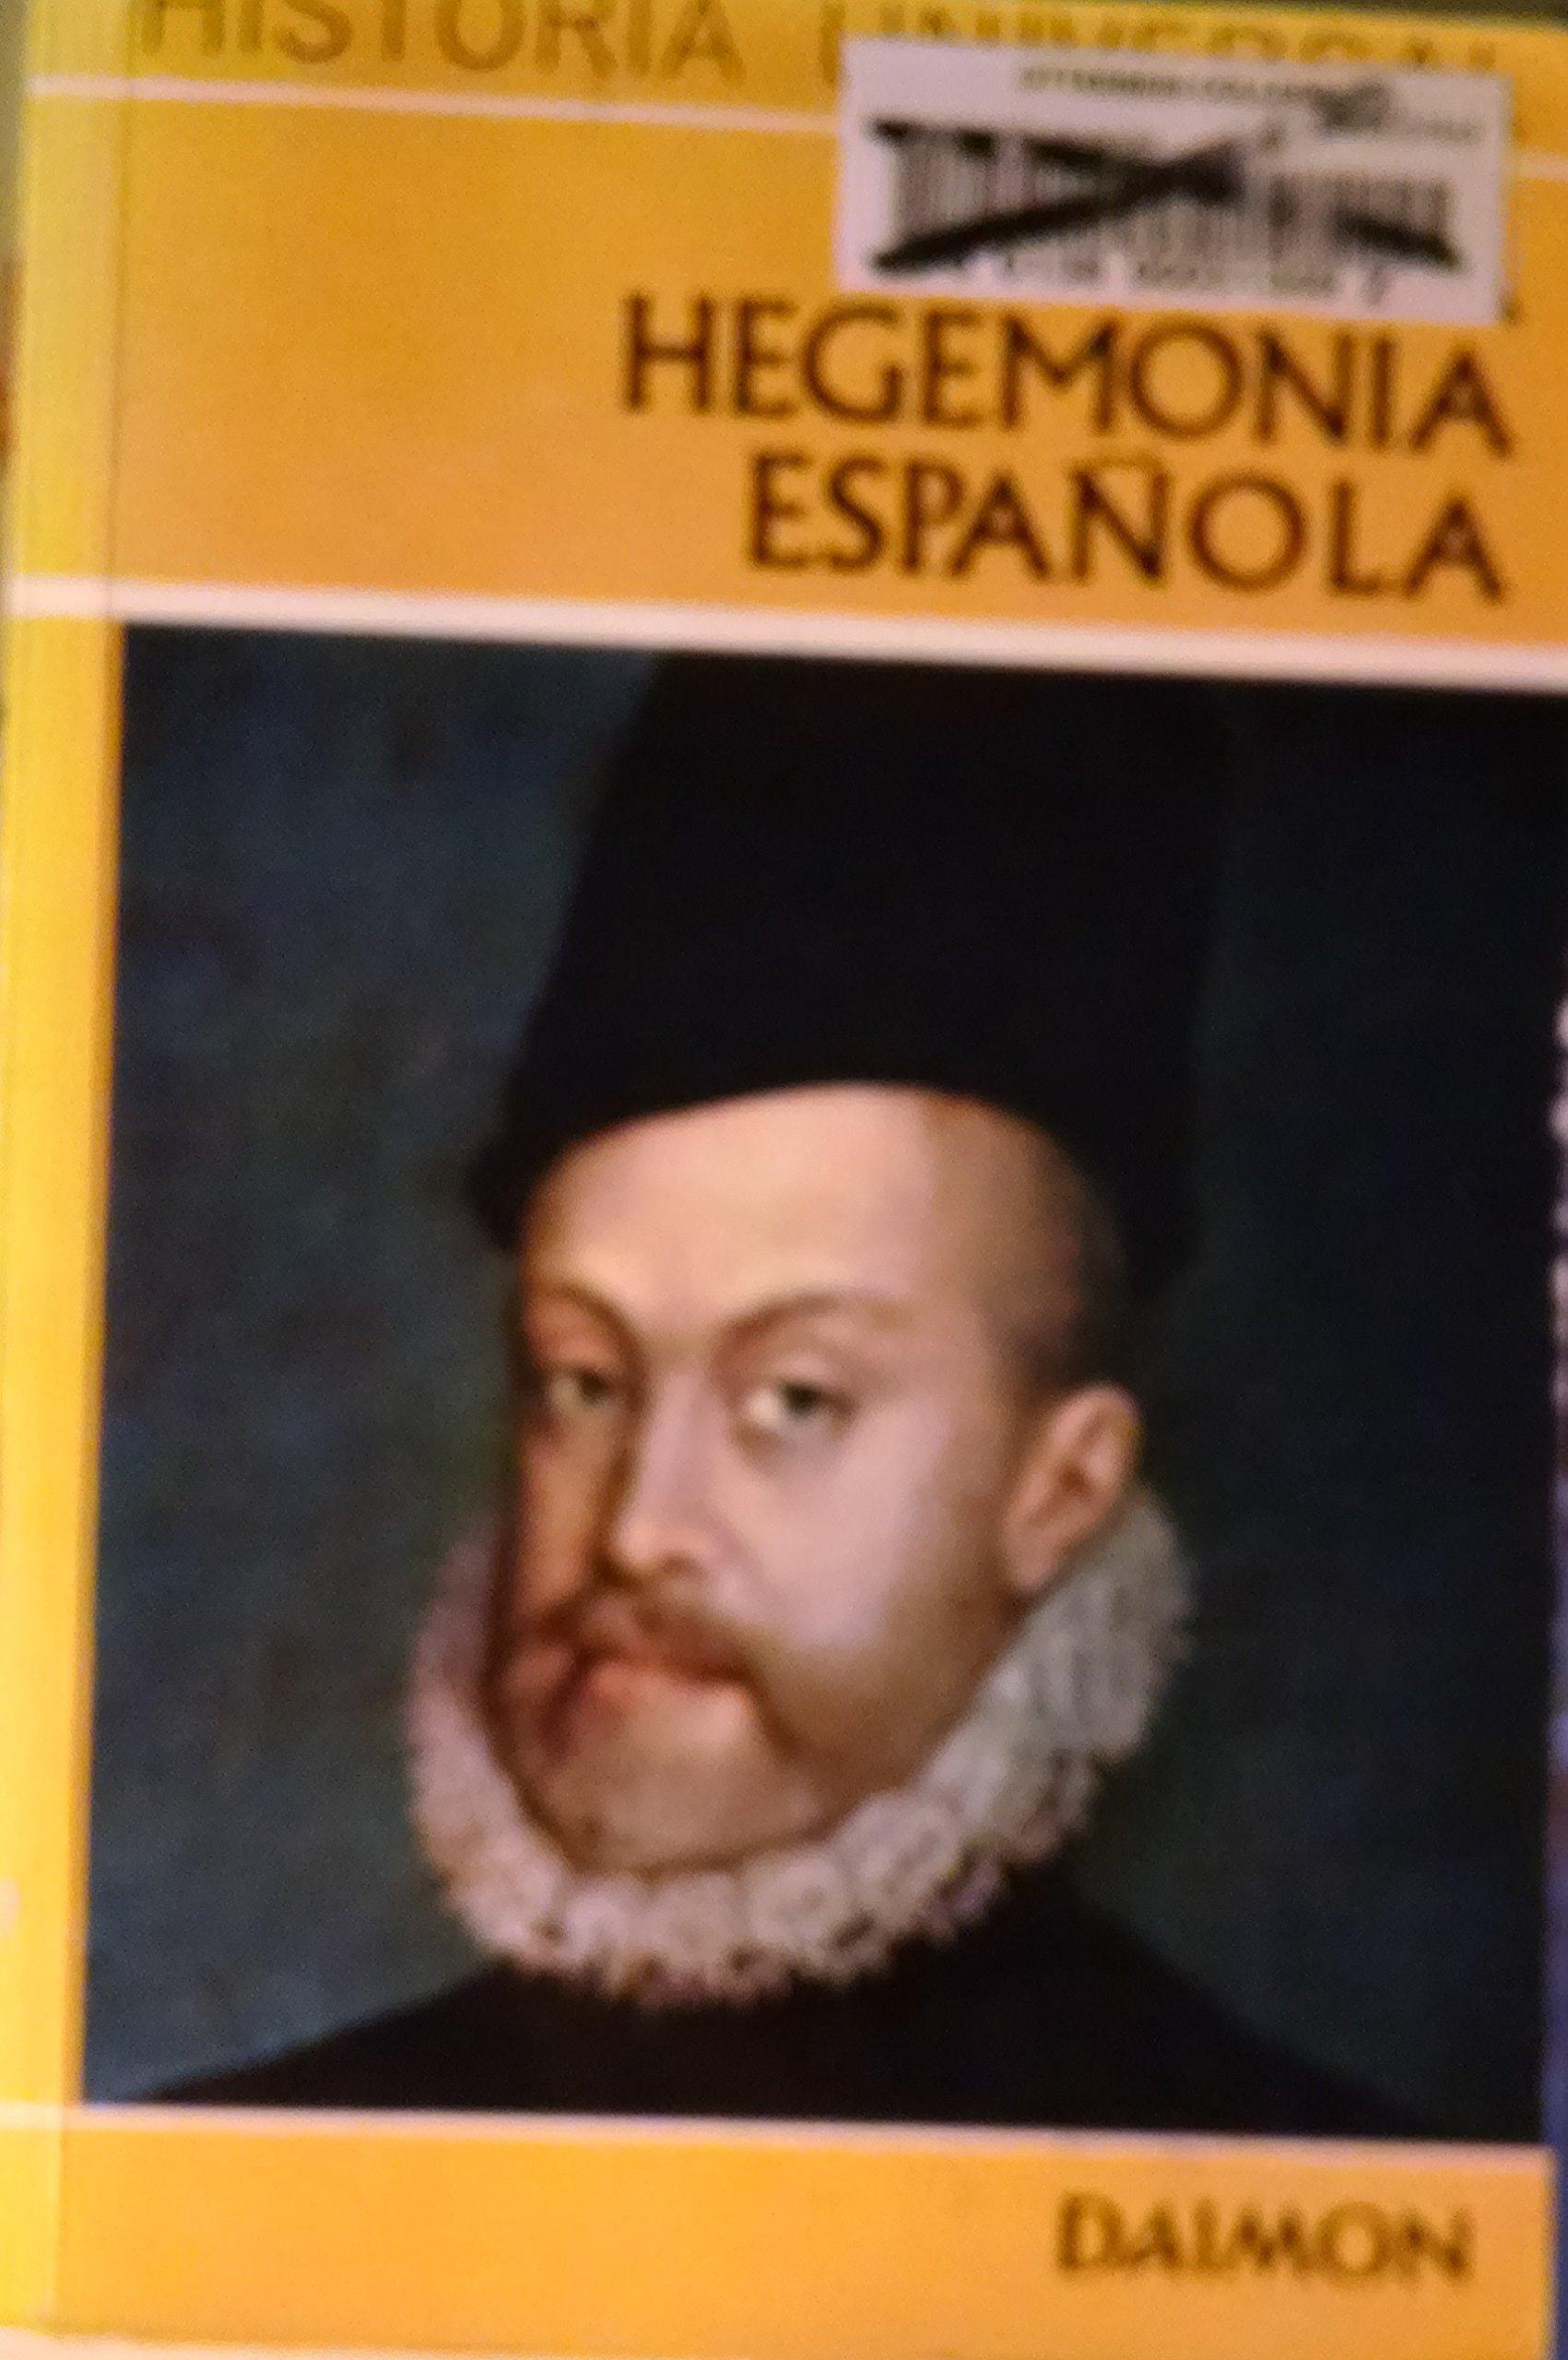 hegemonia española